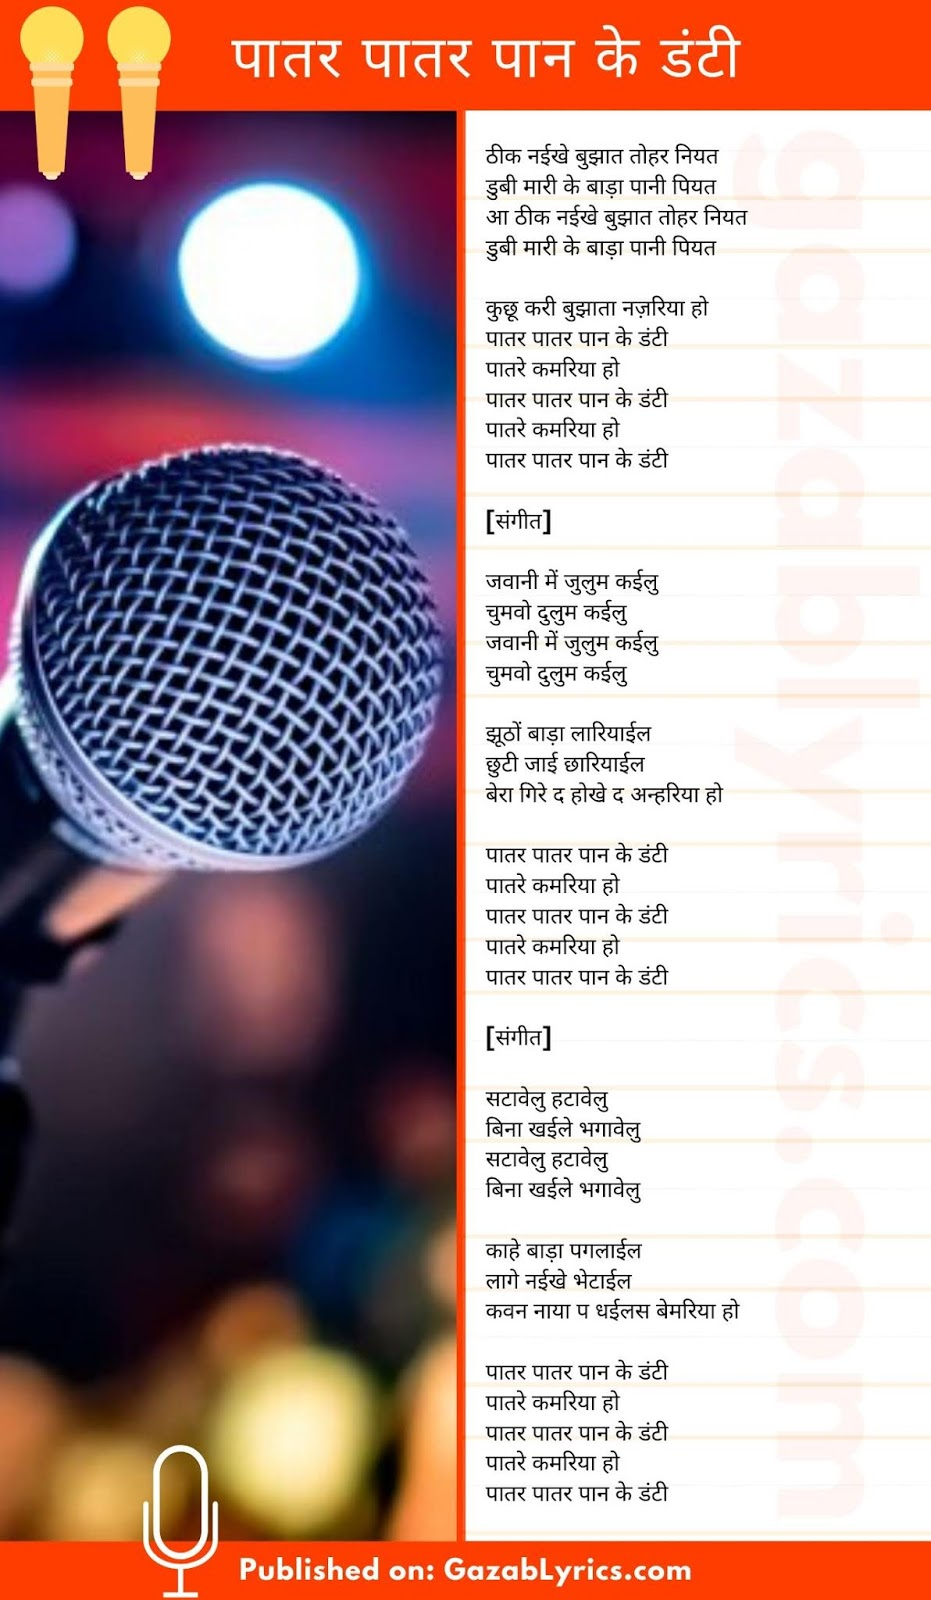 Patar Patar Pan Ke Danti song lyrics image